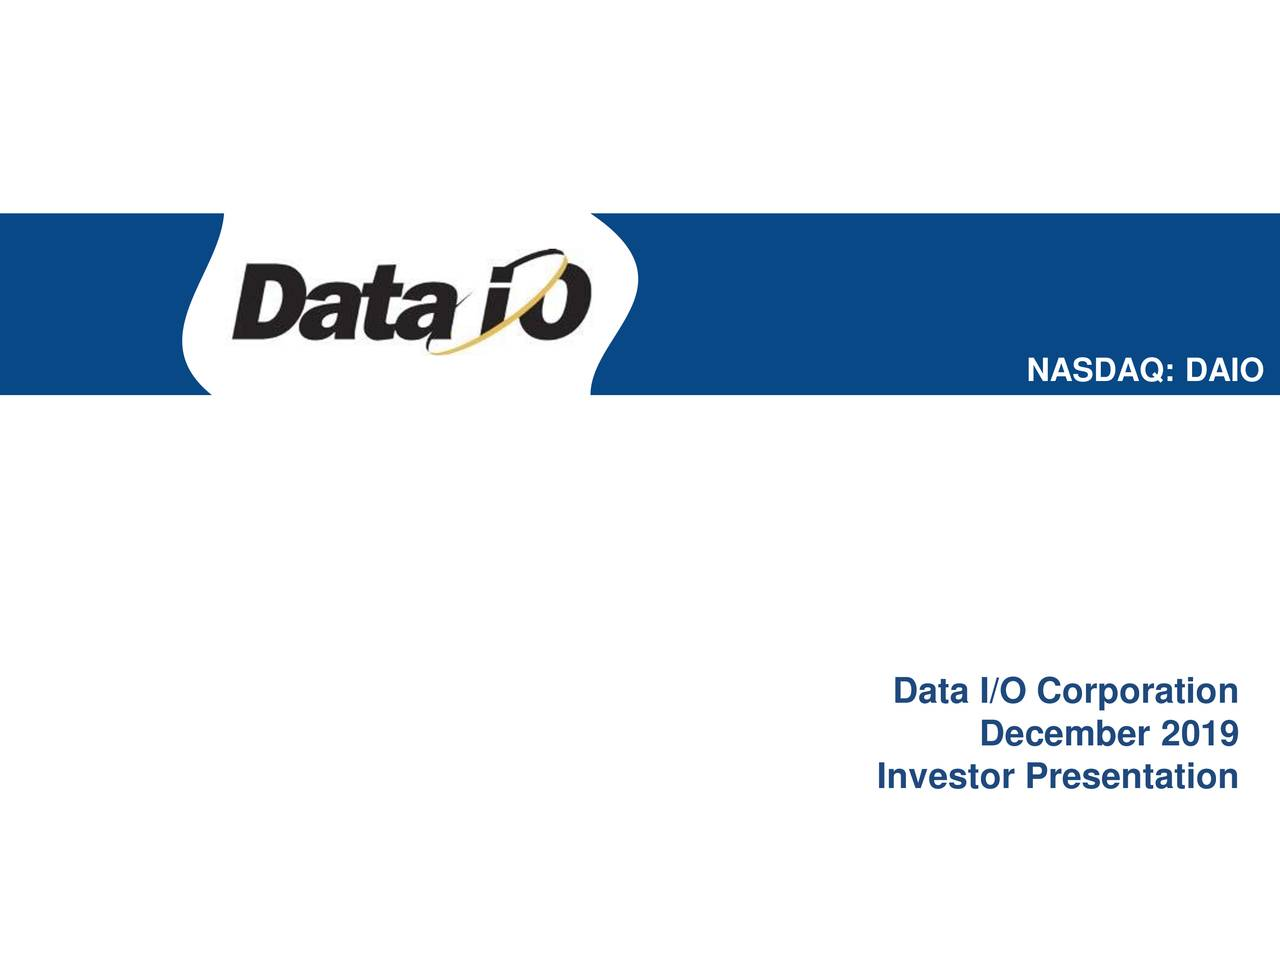 Data I/O (DAIO) Investor Presentation - Slideshow - Data I/O Corporation (NASDAQ:DAIO) | Seeking Alpha